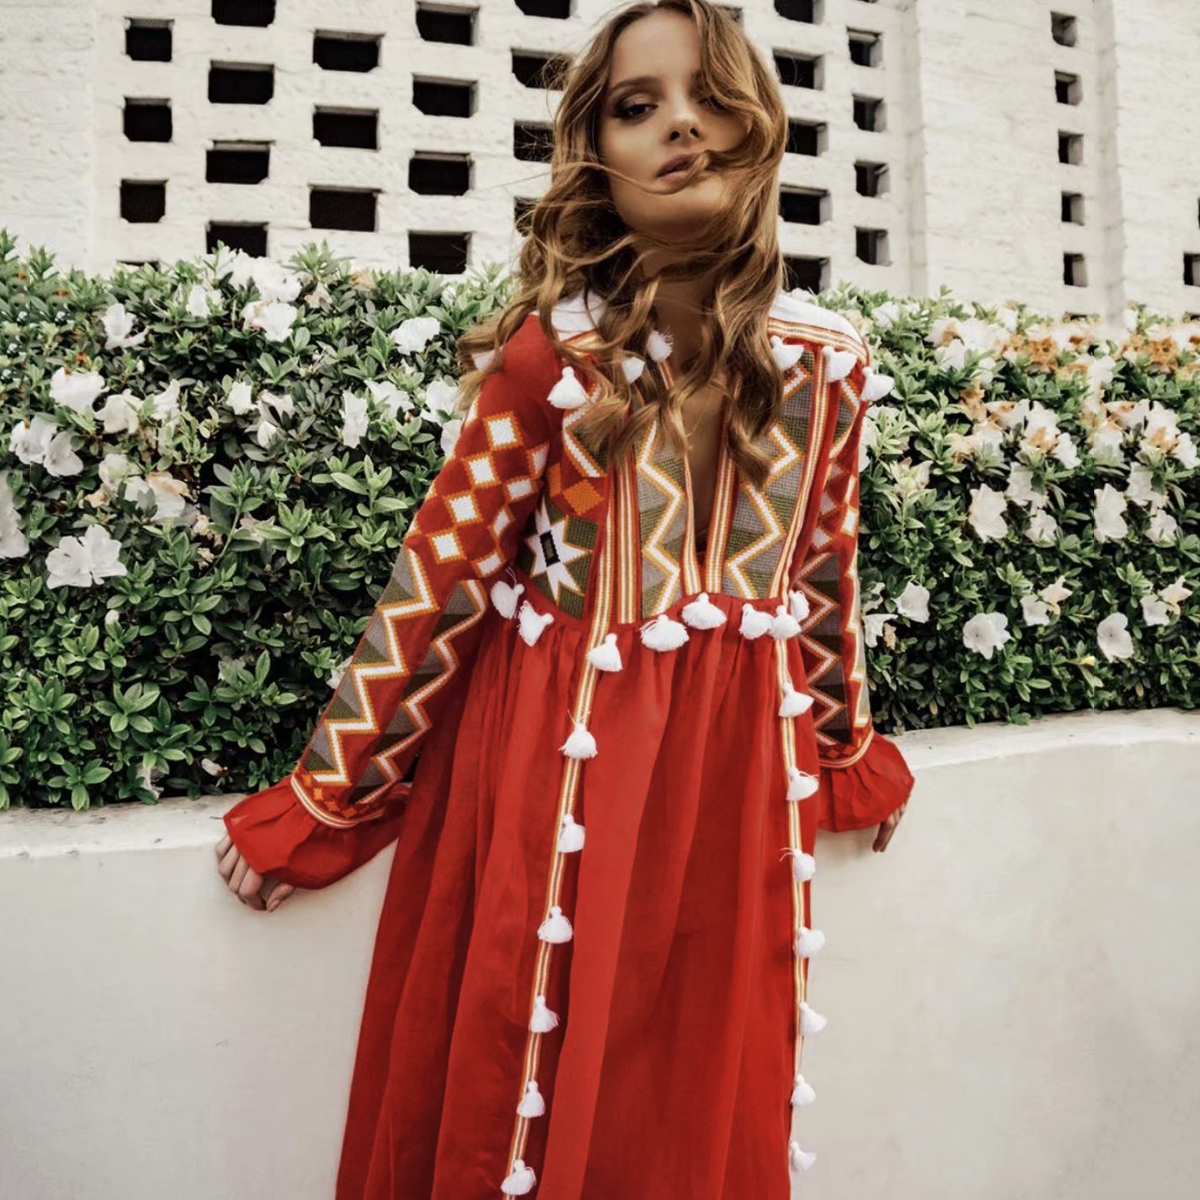 Jastie V-cou À Manches Longues Automne Robe Boho Broderie Pompon Glands Vintage Robes Femmes Lâche L'ukraine Robe Femme Robes